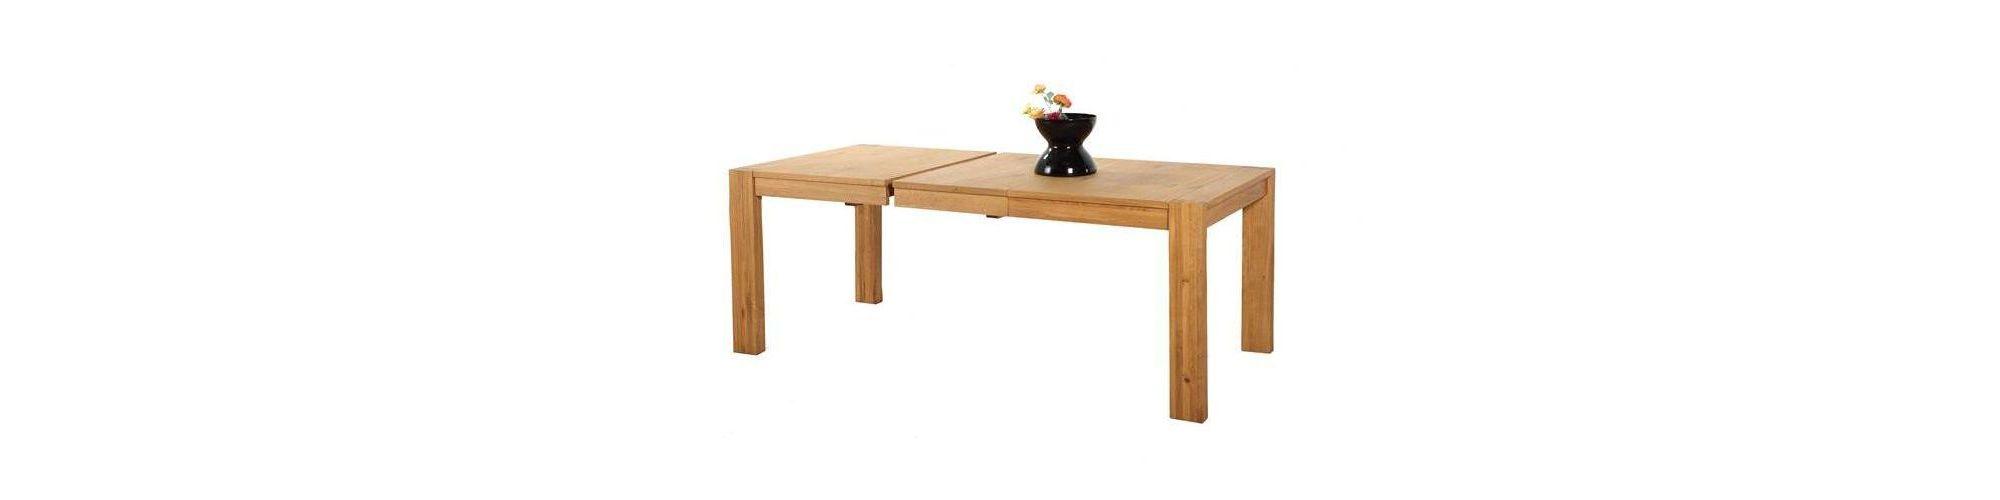 Extending Table 187 Tesco Extending Tables : 793 9534PI1000015MNwid2000amphei2000 from extendingtable.co.uk size 2000 x 2000 jpeg 37kB